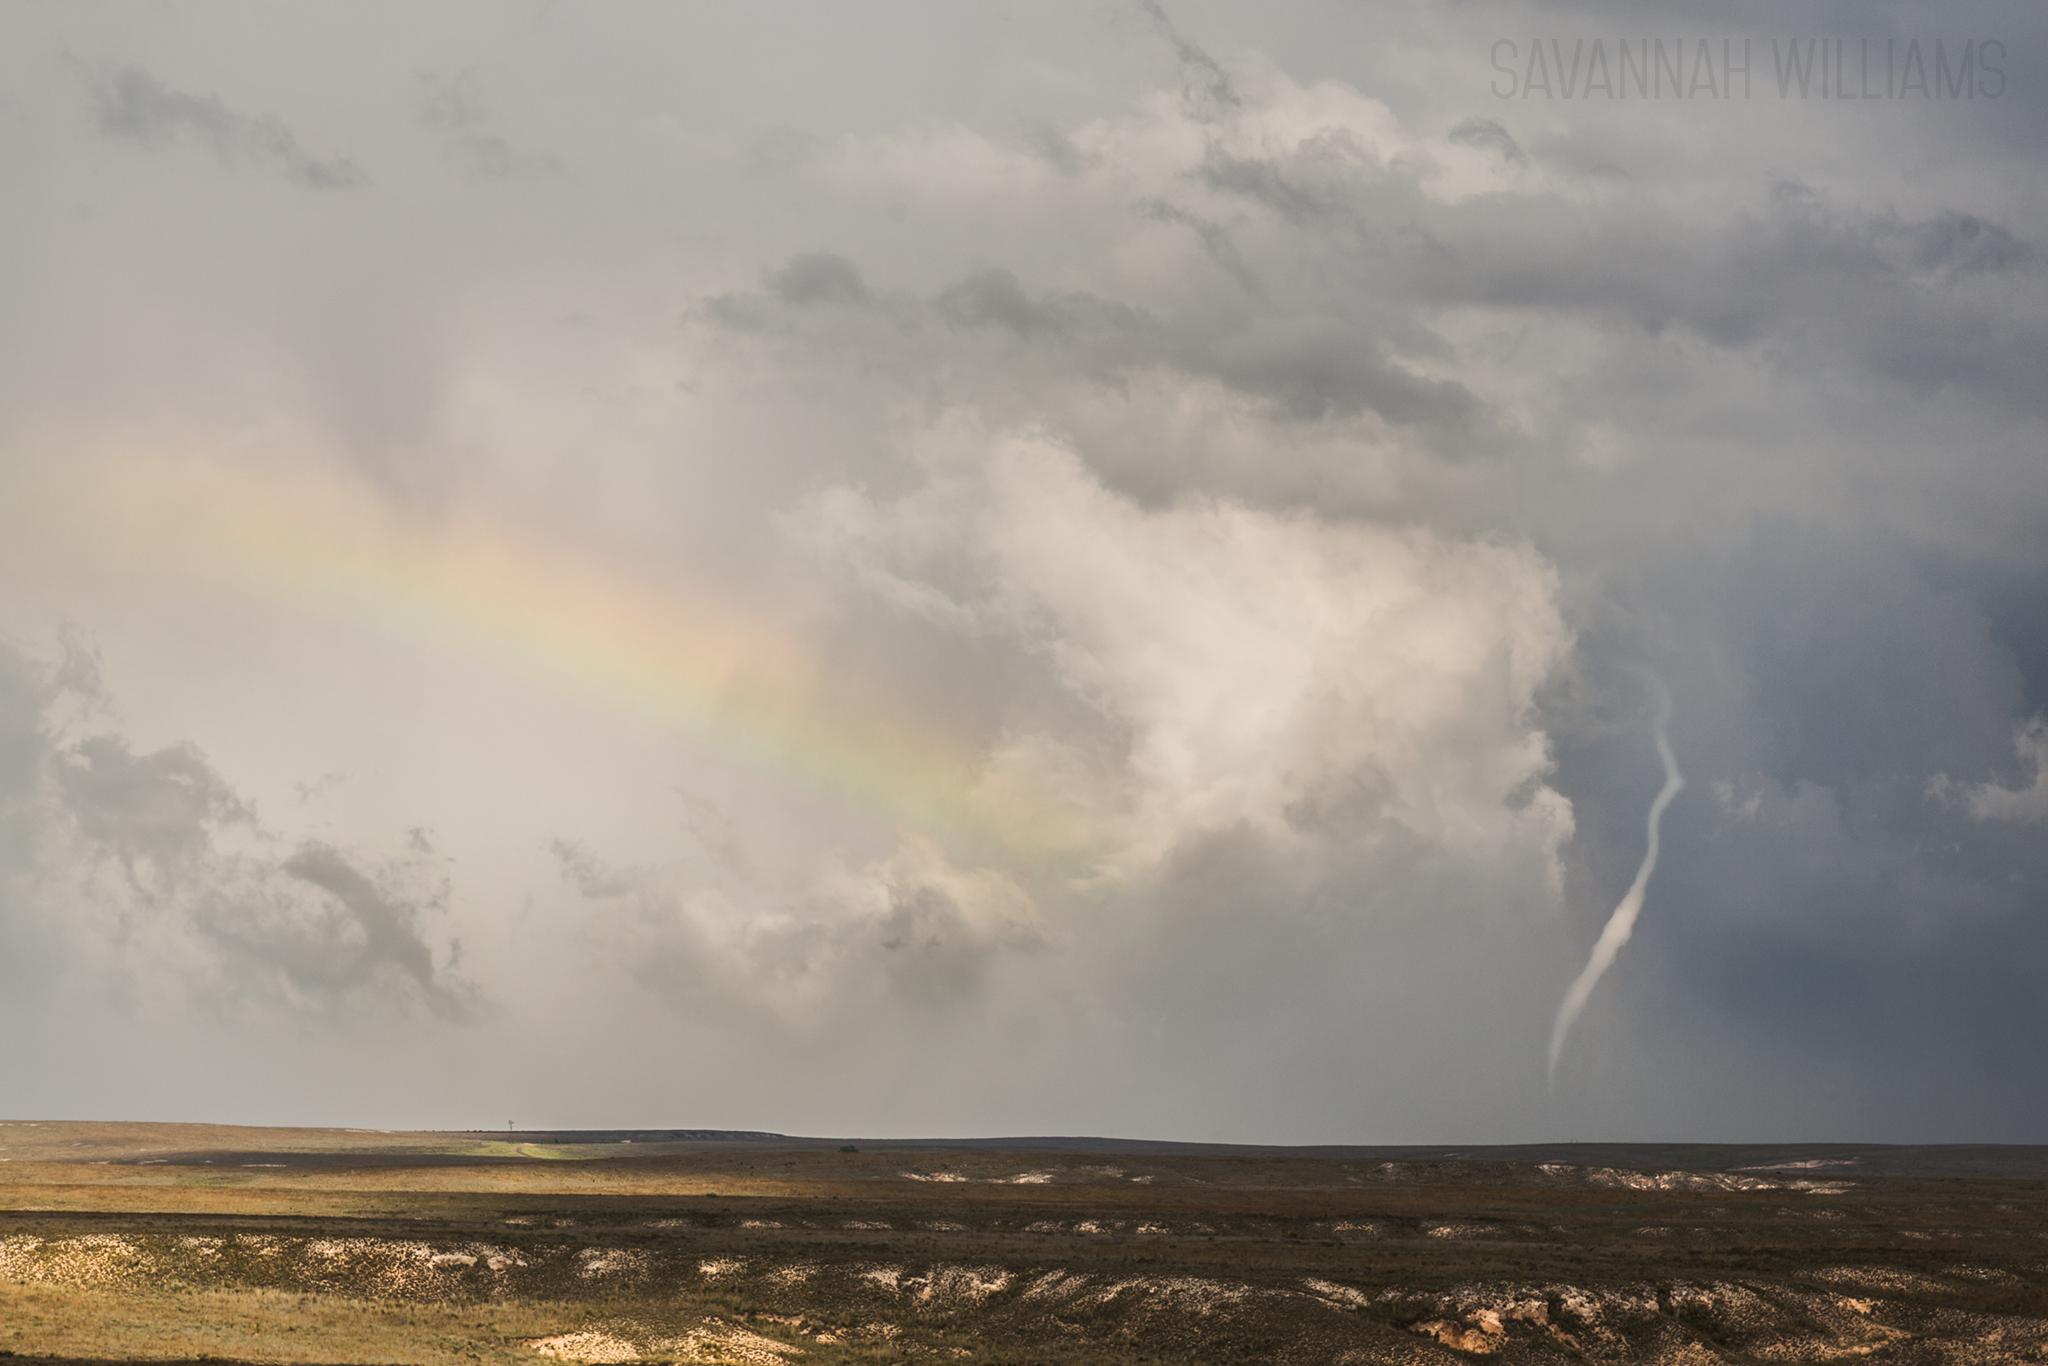 Tornado near Groom, Tx. Image by Savannah Williams. I sat back and enjoyed the moment.